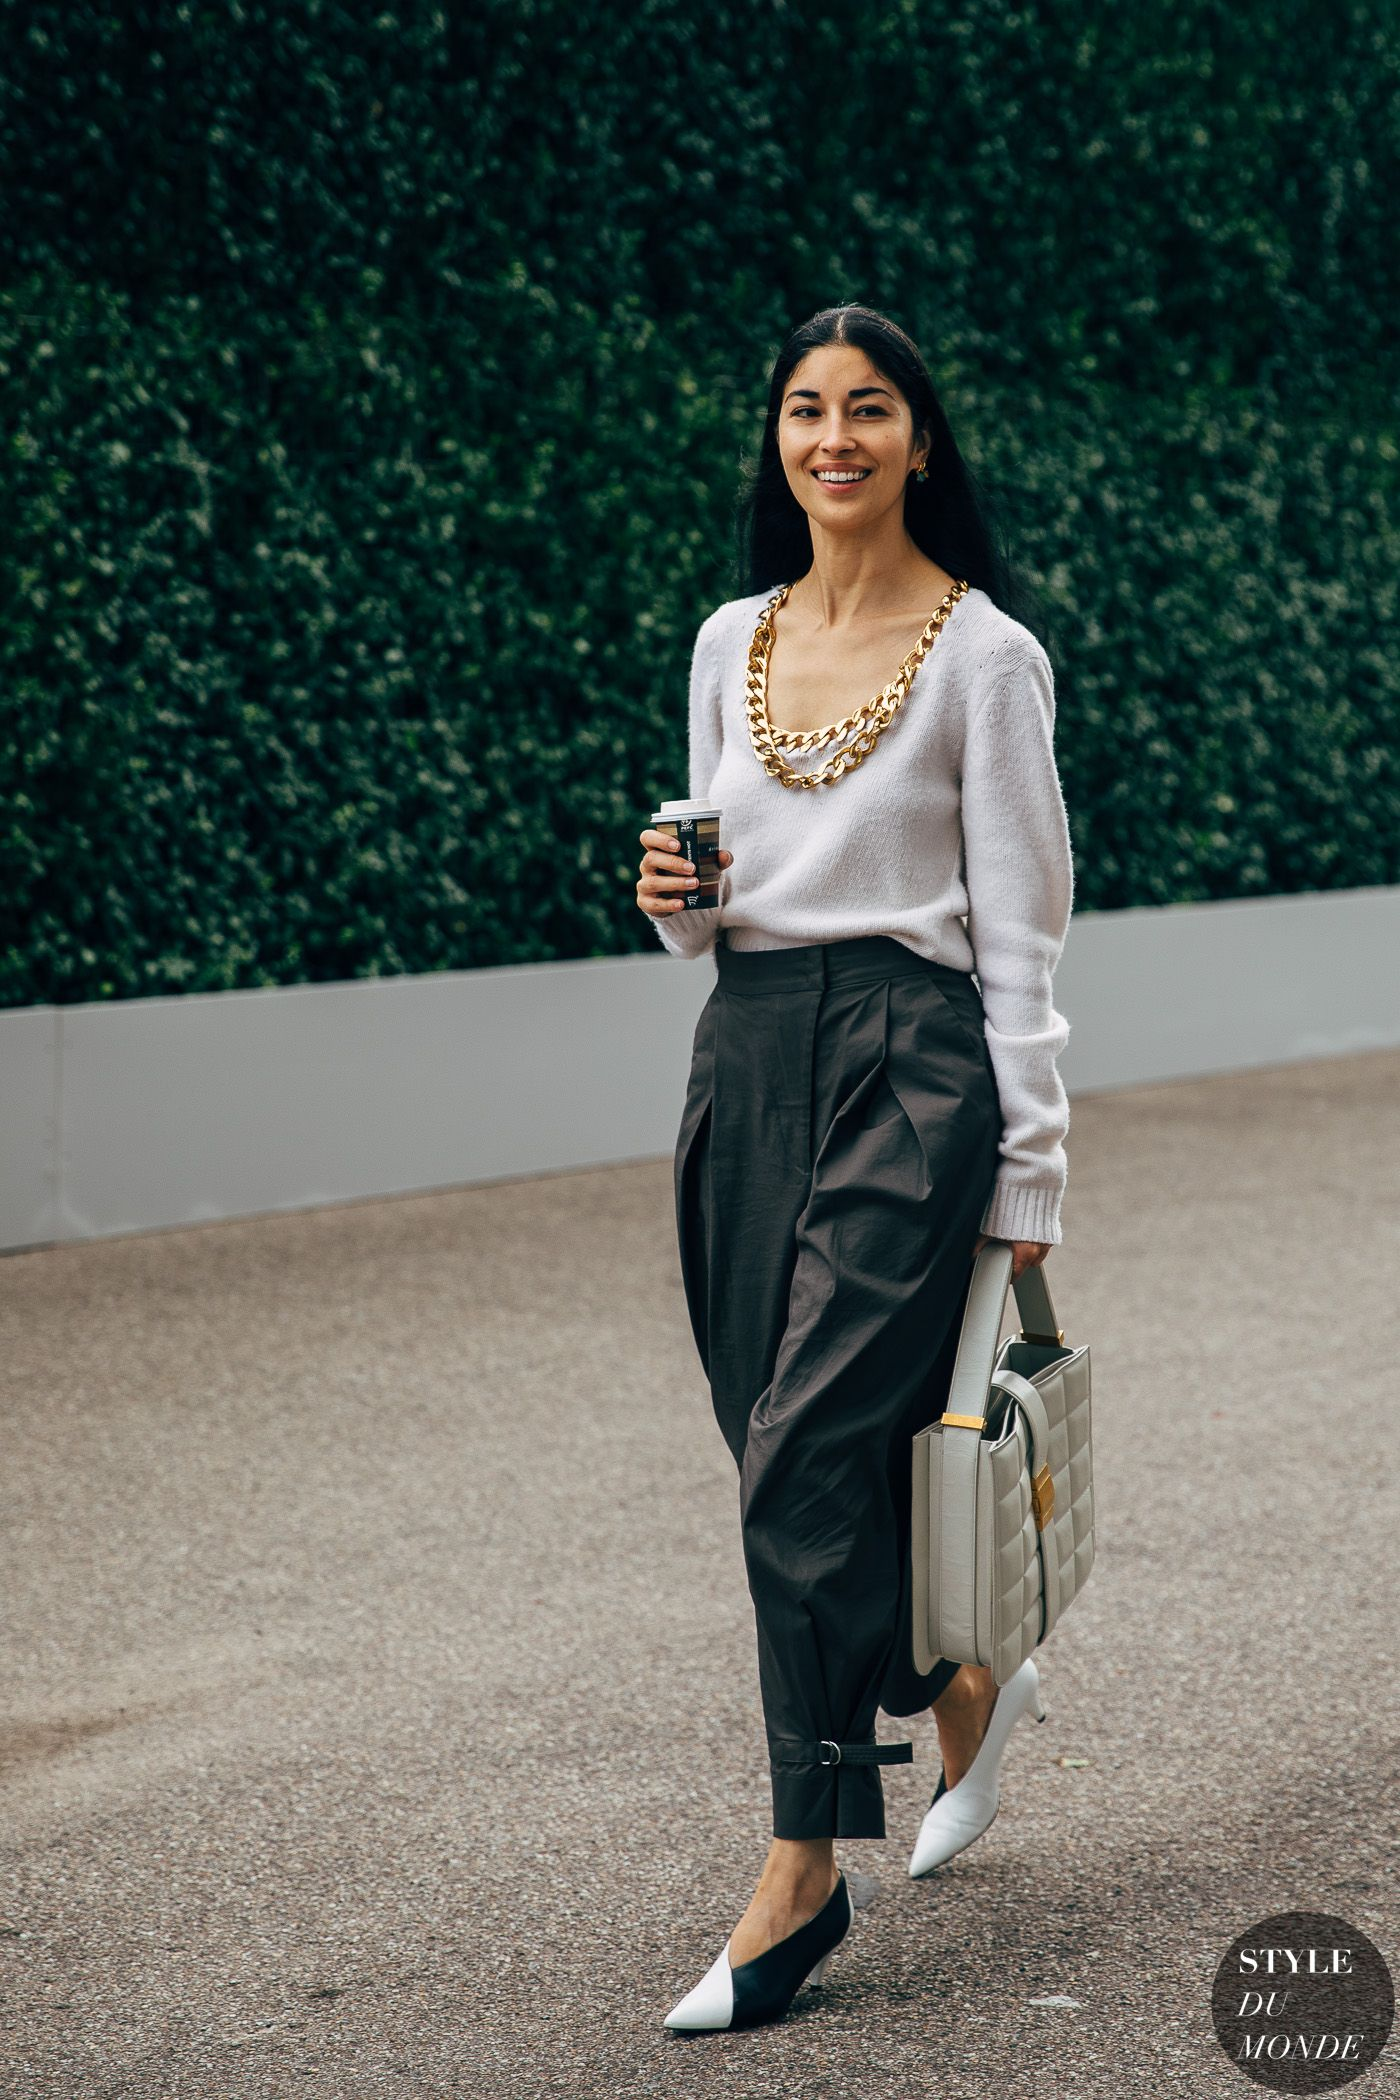 Milan SS 2020 Street Style: Caroline Issa – STYLE DU MONDE | Street Style Street Fashion Photos Caroline Issa